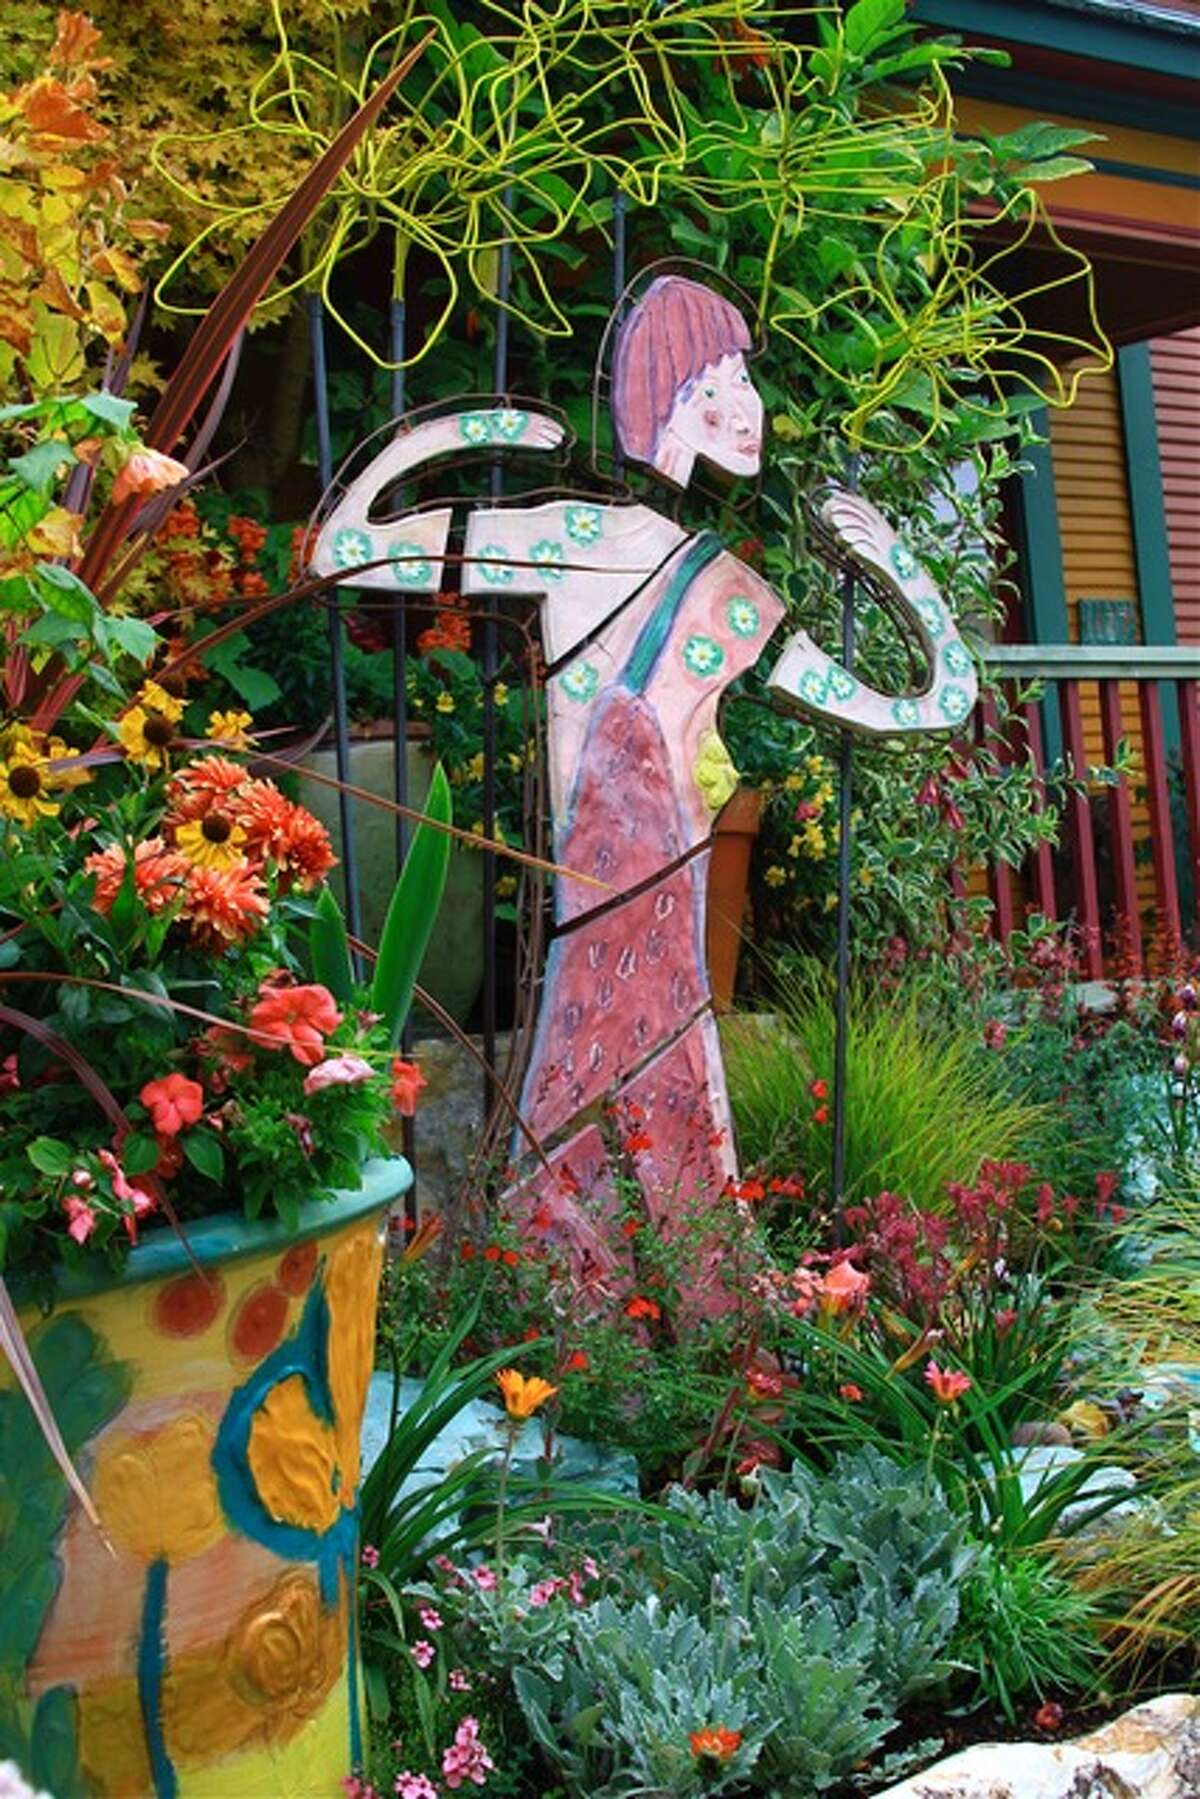 Ceramic and metal sculpture with harmonious plantings